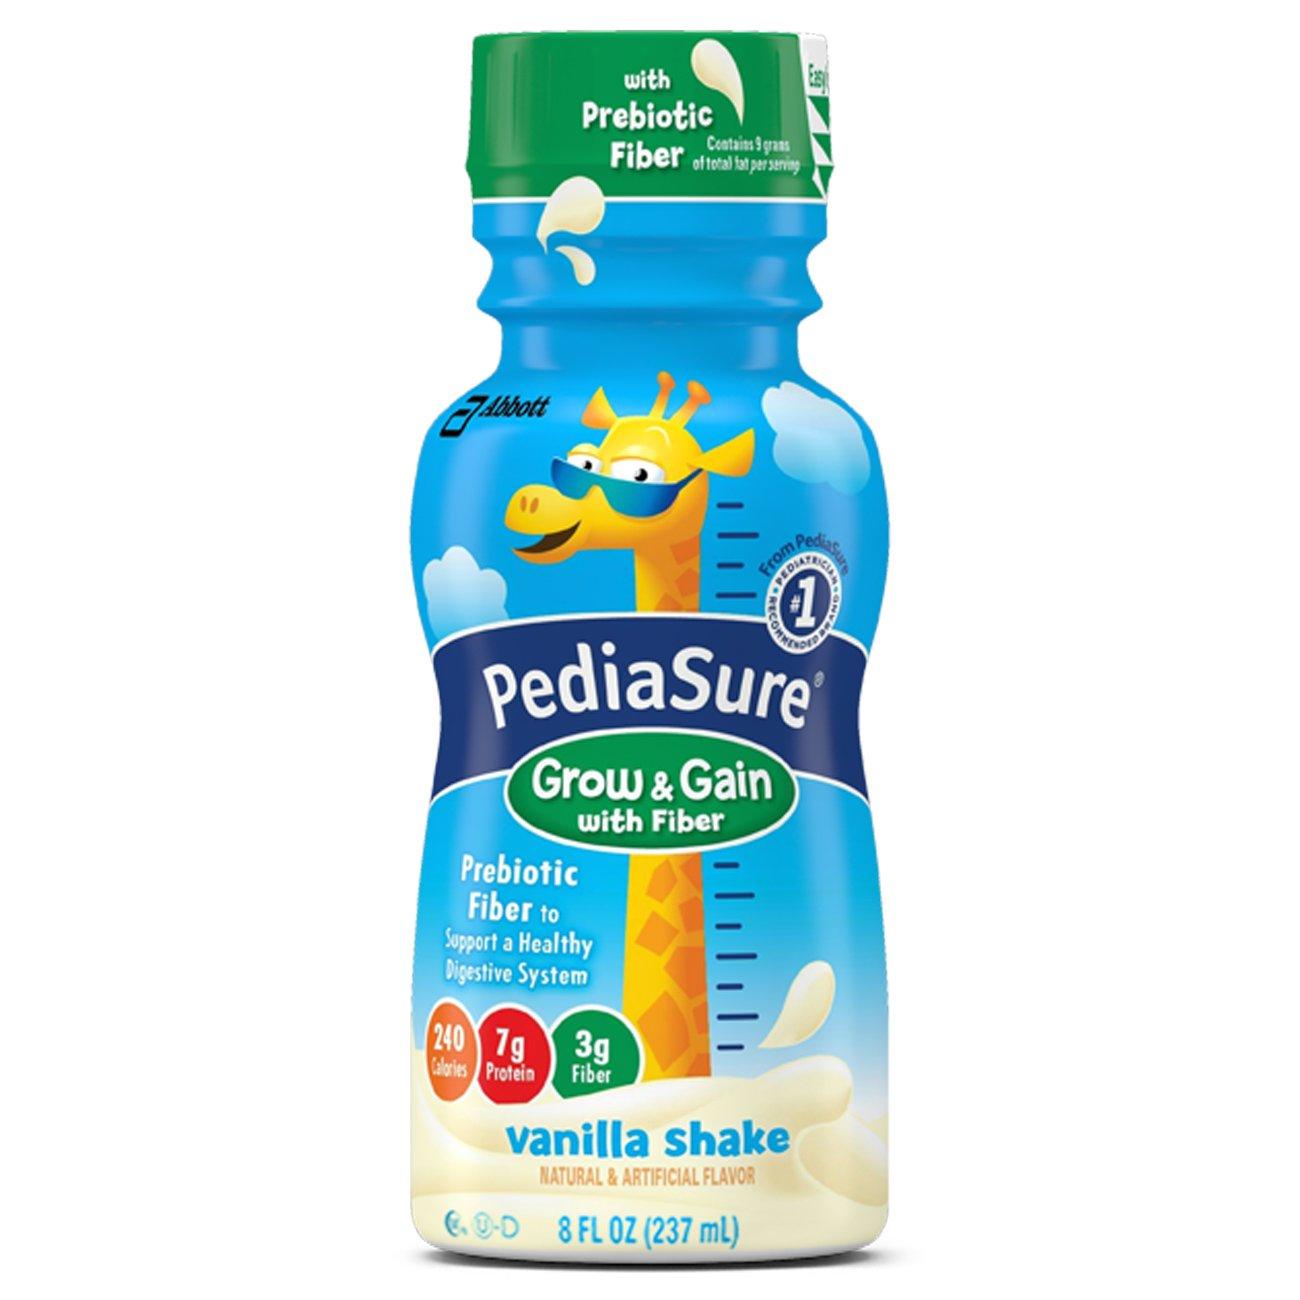 PediaSure Grow & Gain Nutrition Shake with Fiber for Kids, Vanilla, 8 fl oz, 24 Count